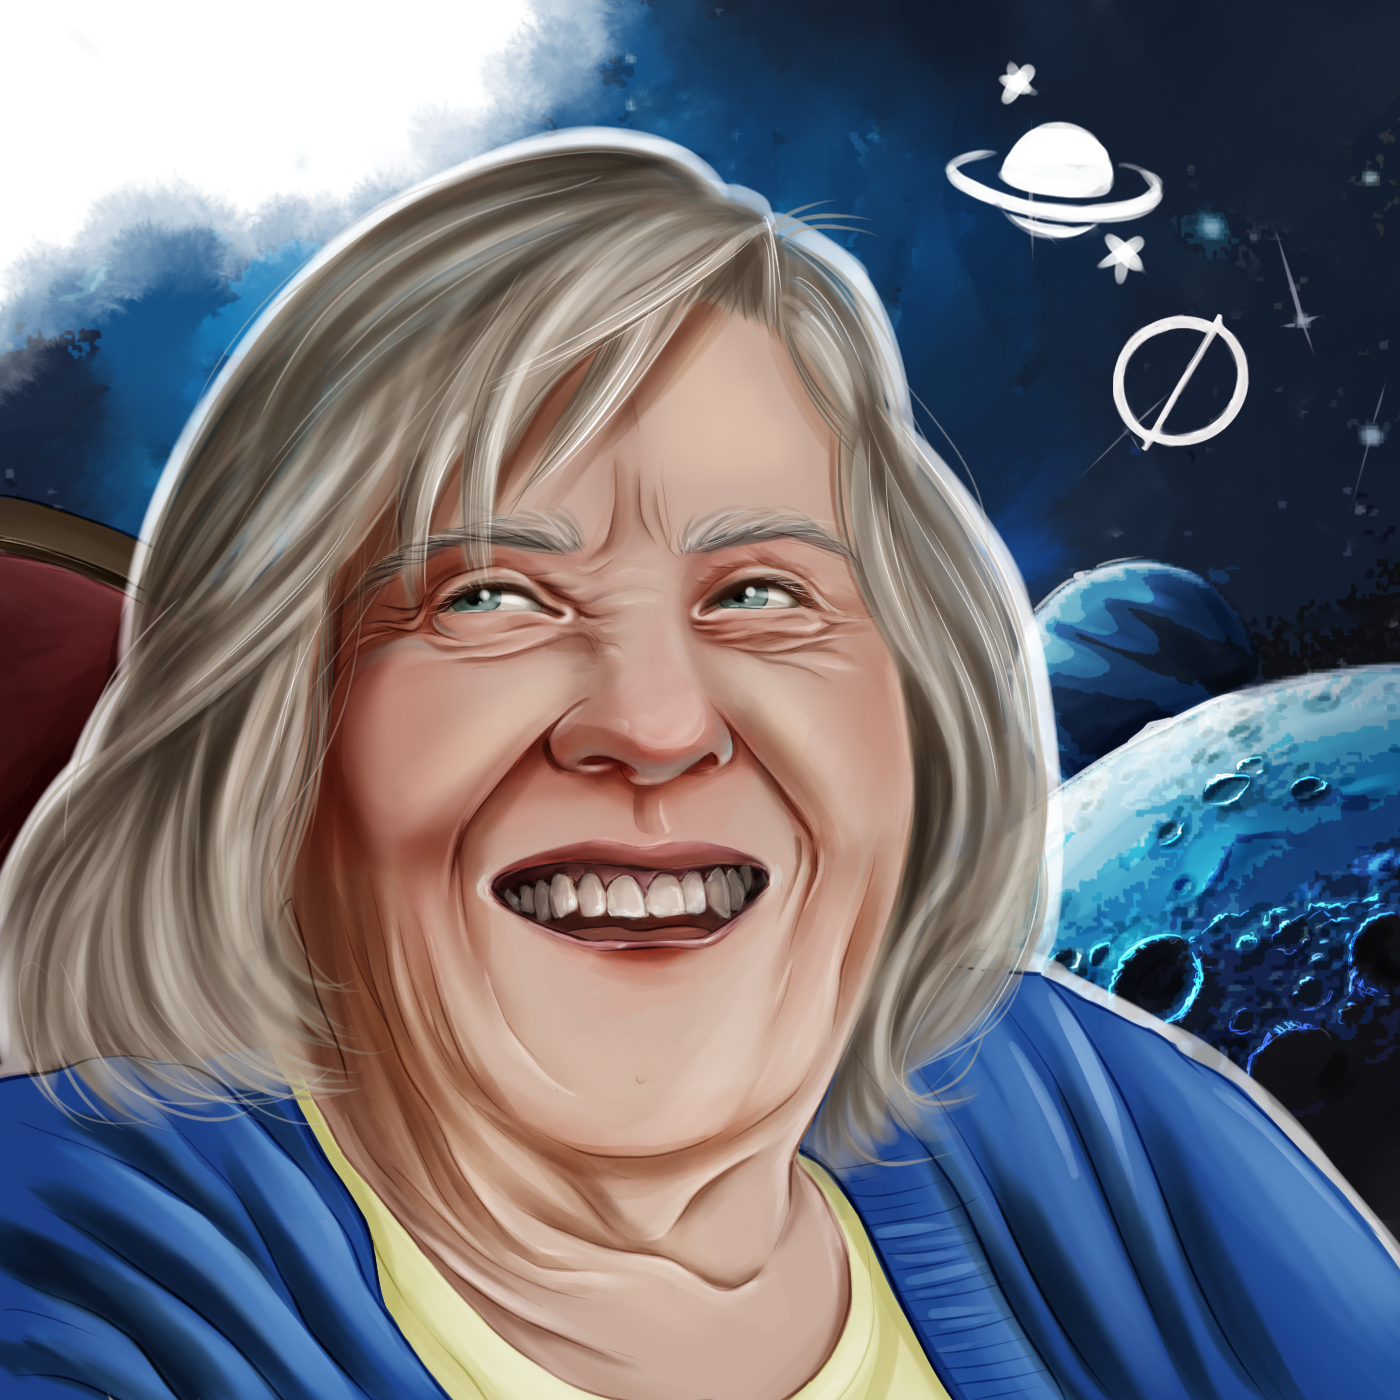 Margherita Hack, libera pensatrice